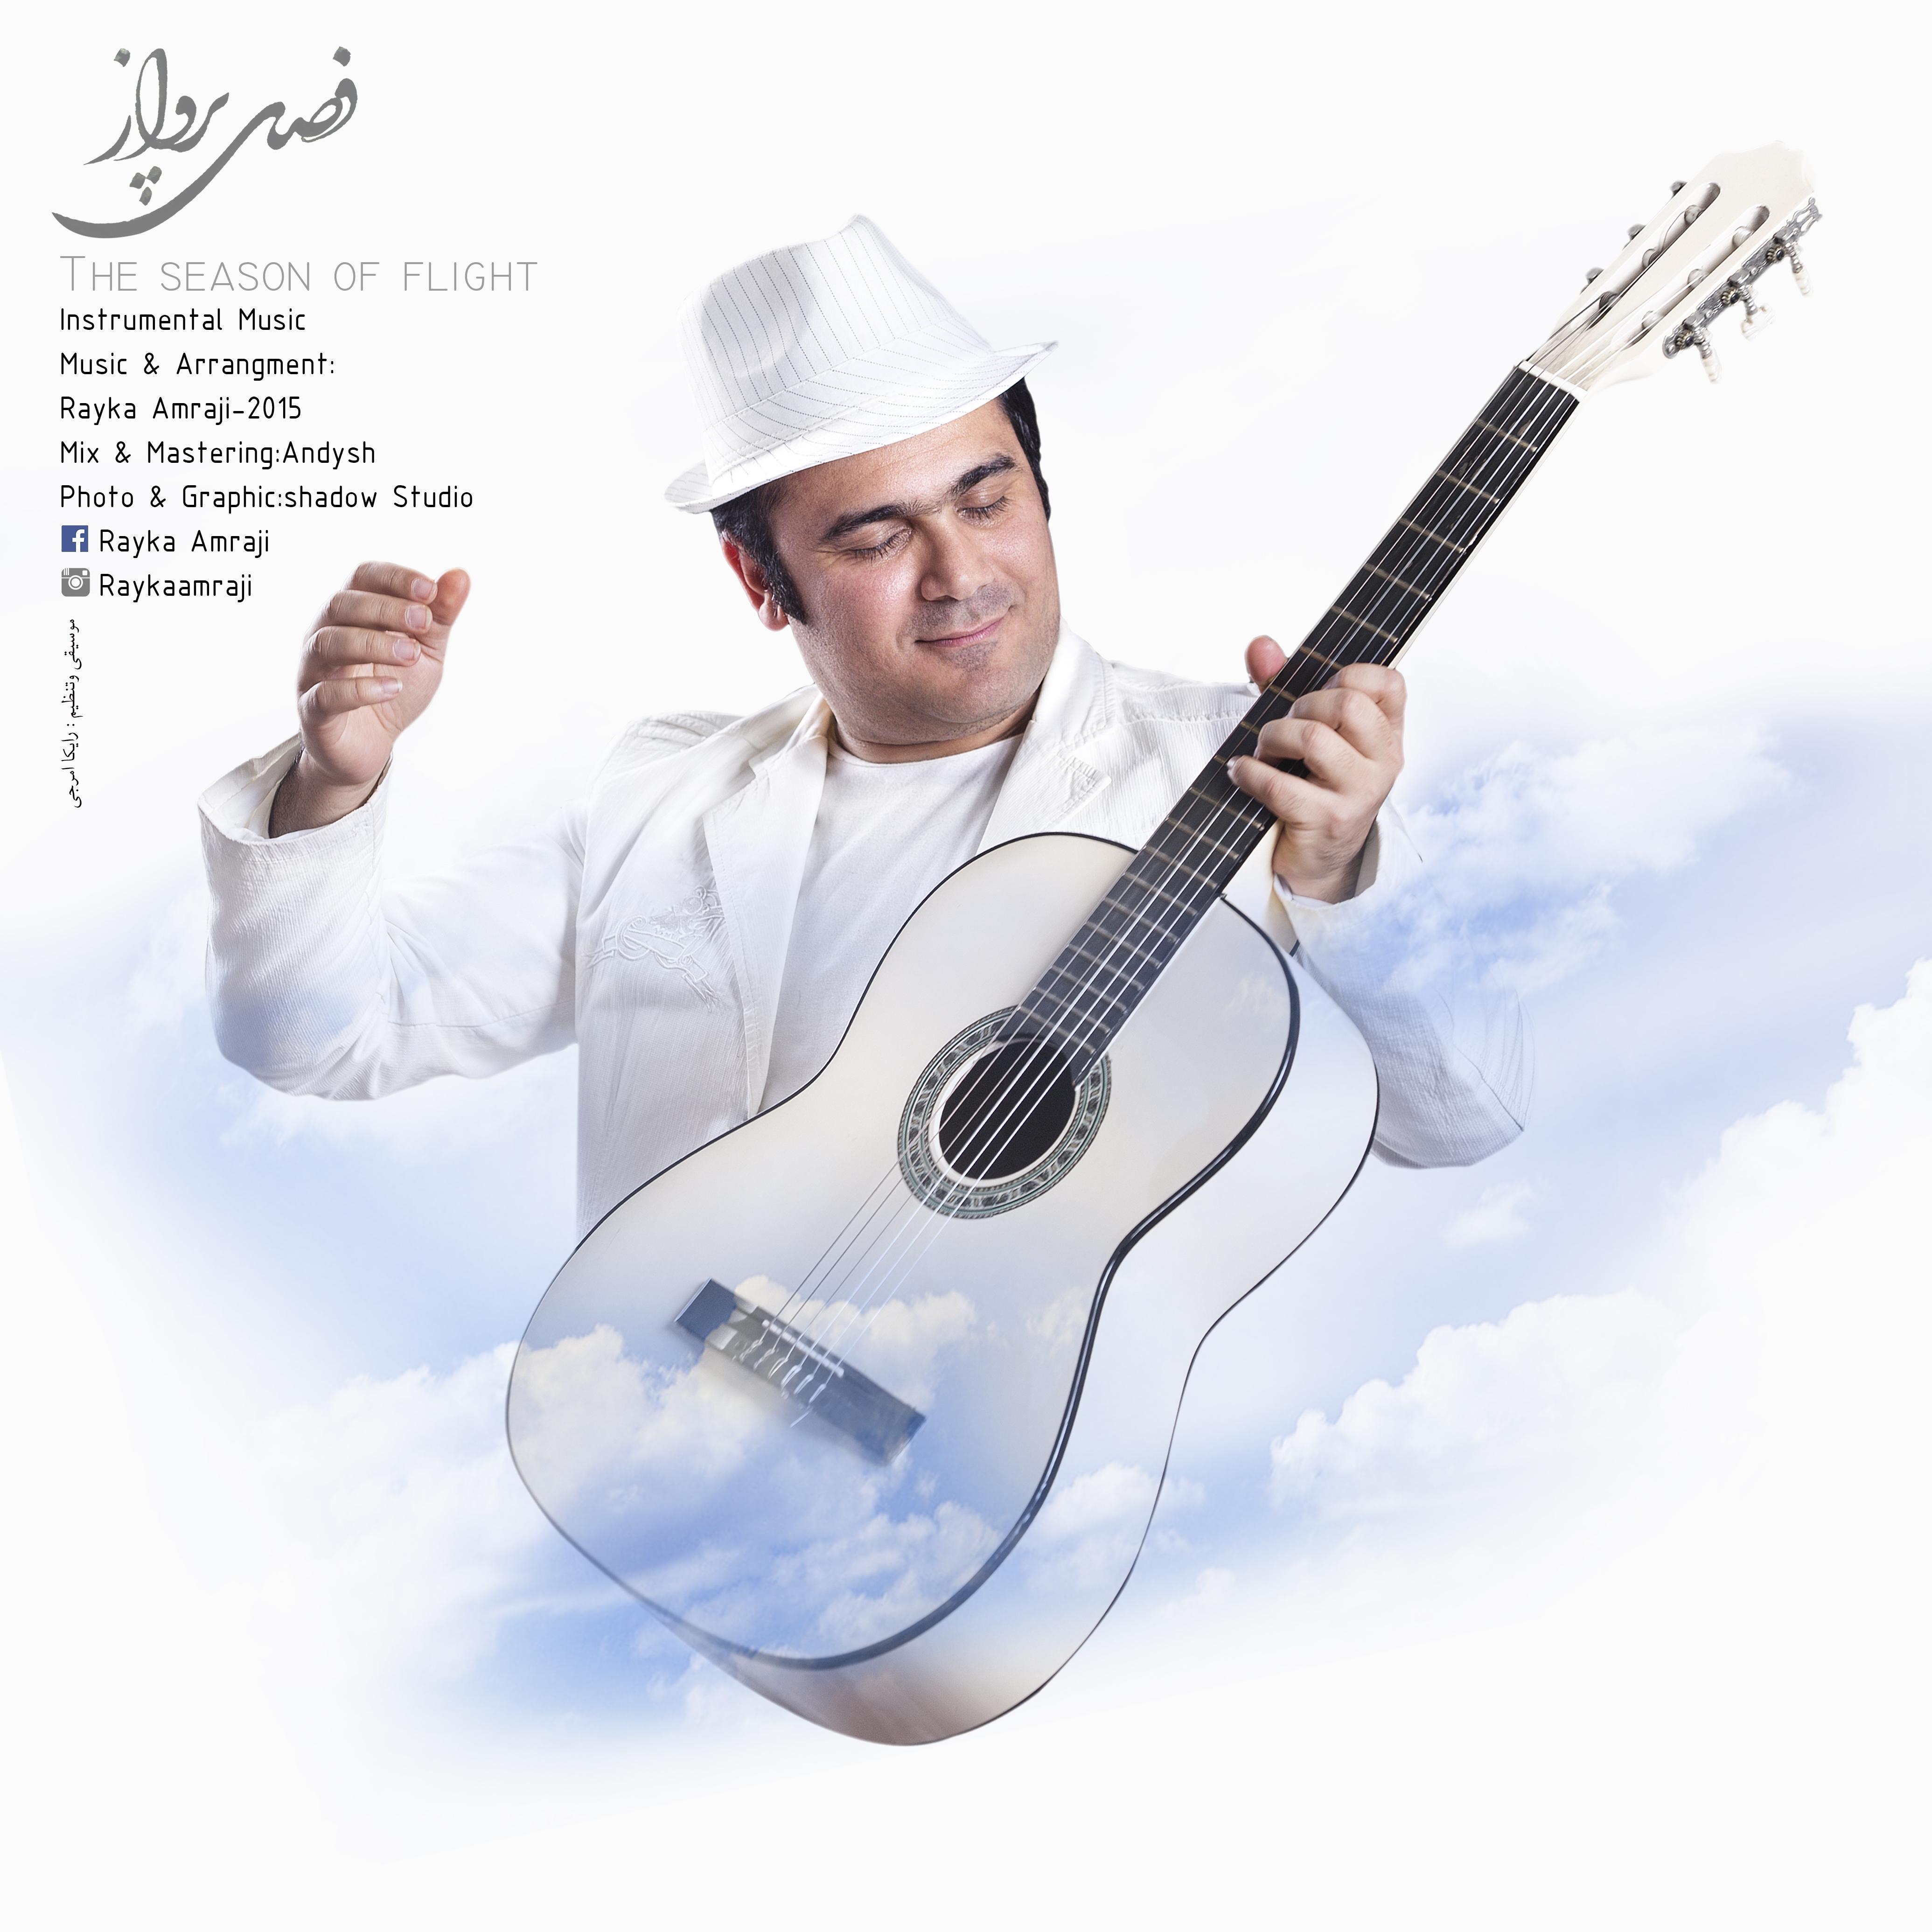 Rayka Amraji (The Season of flight)Instrumental